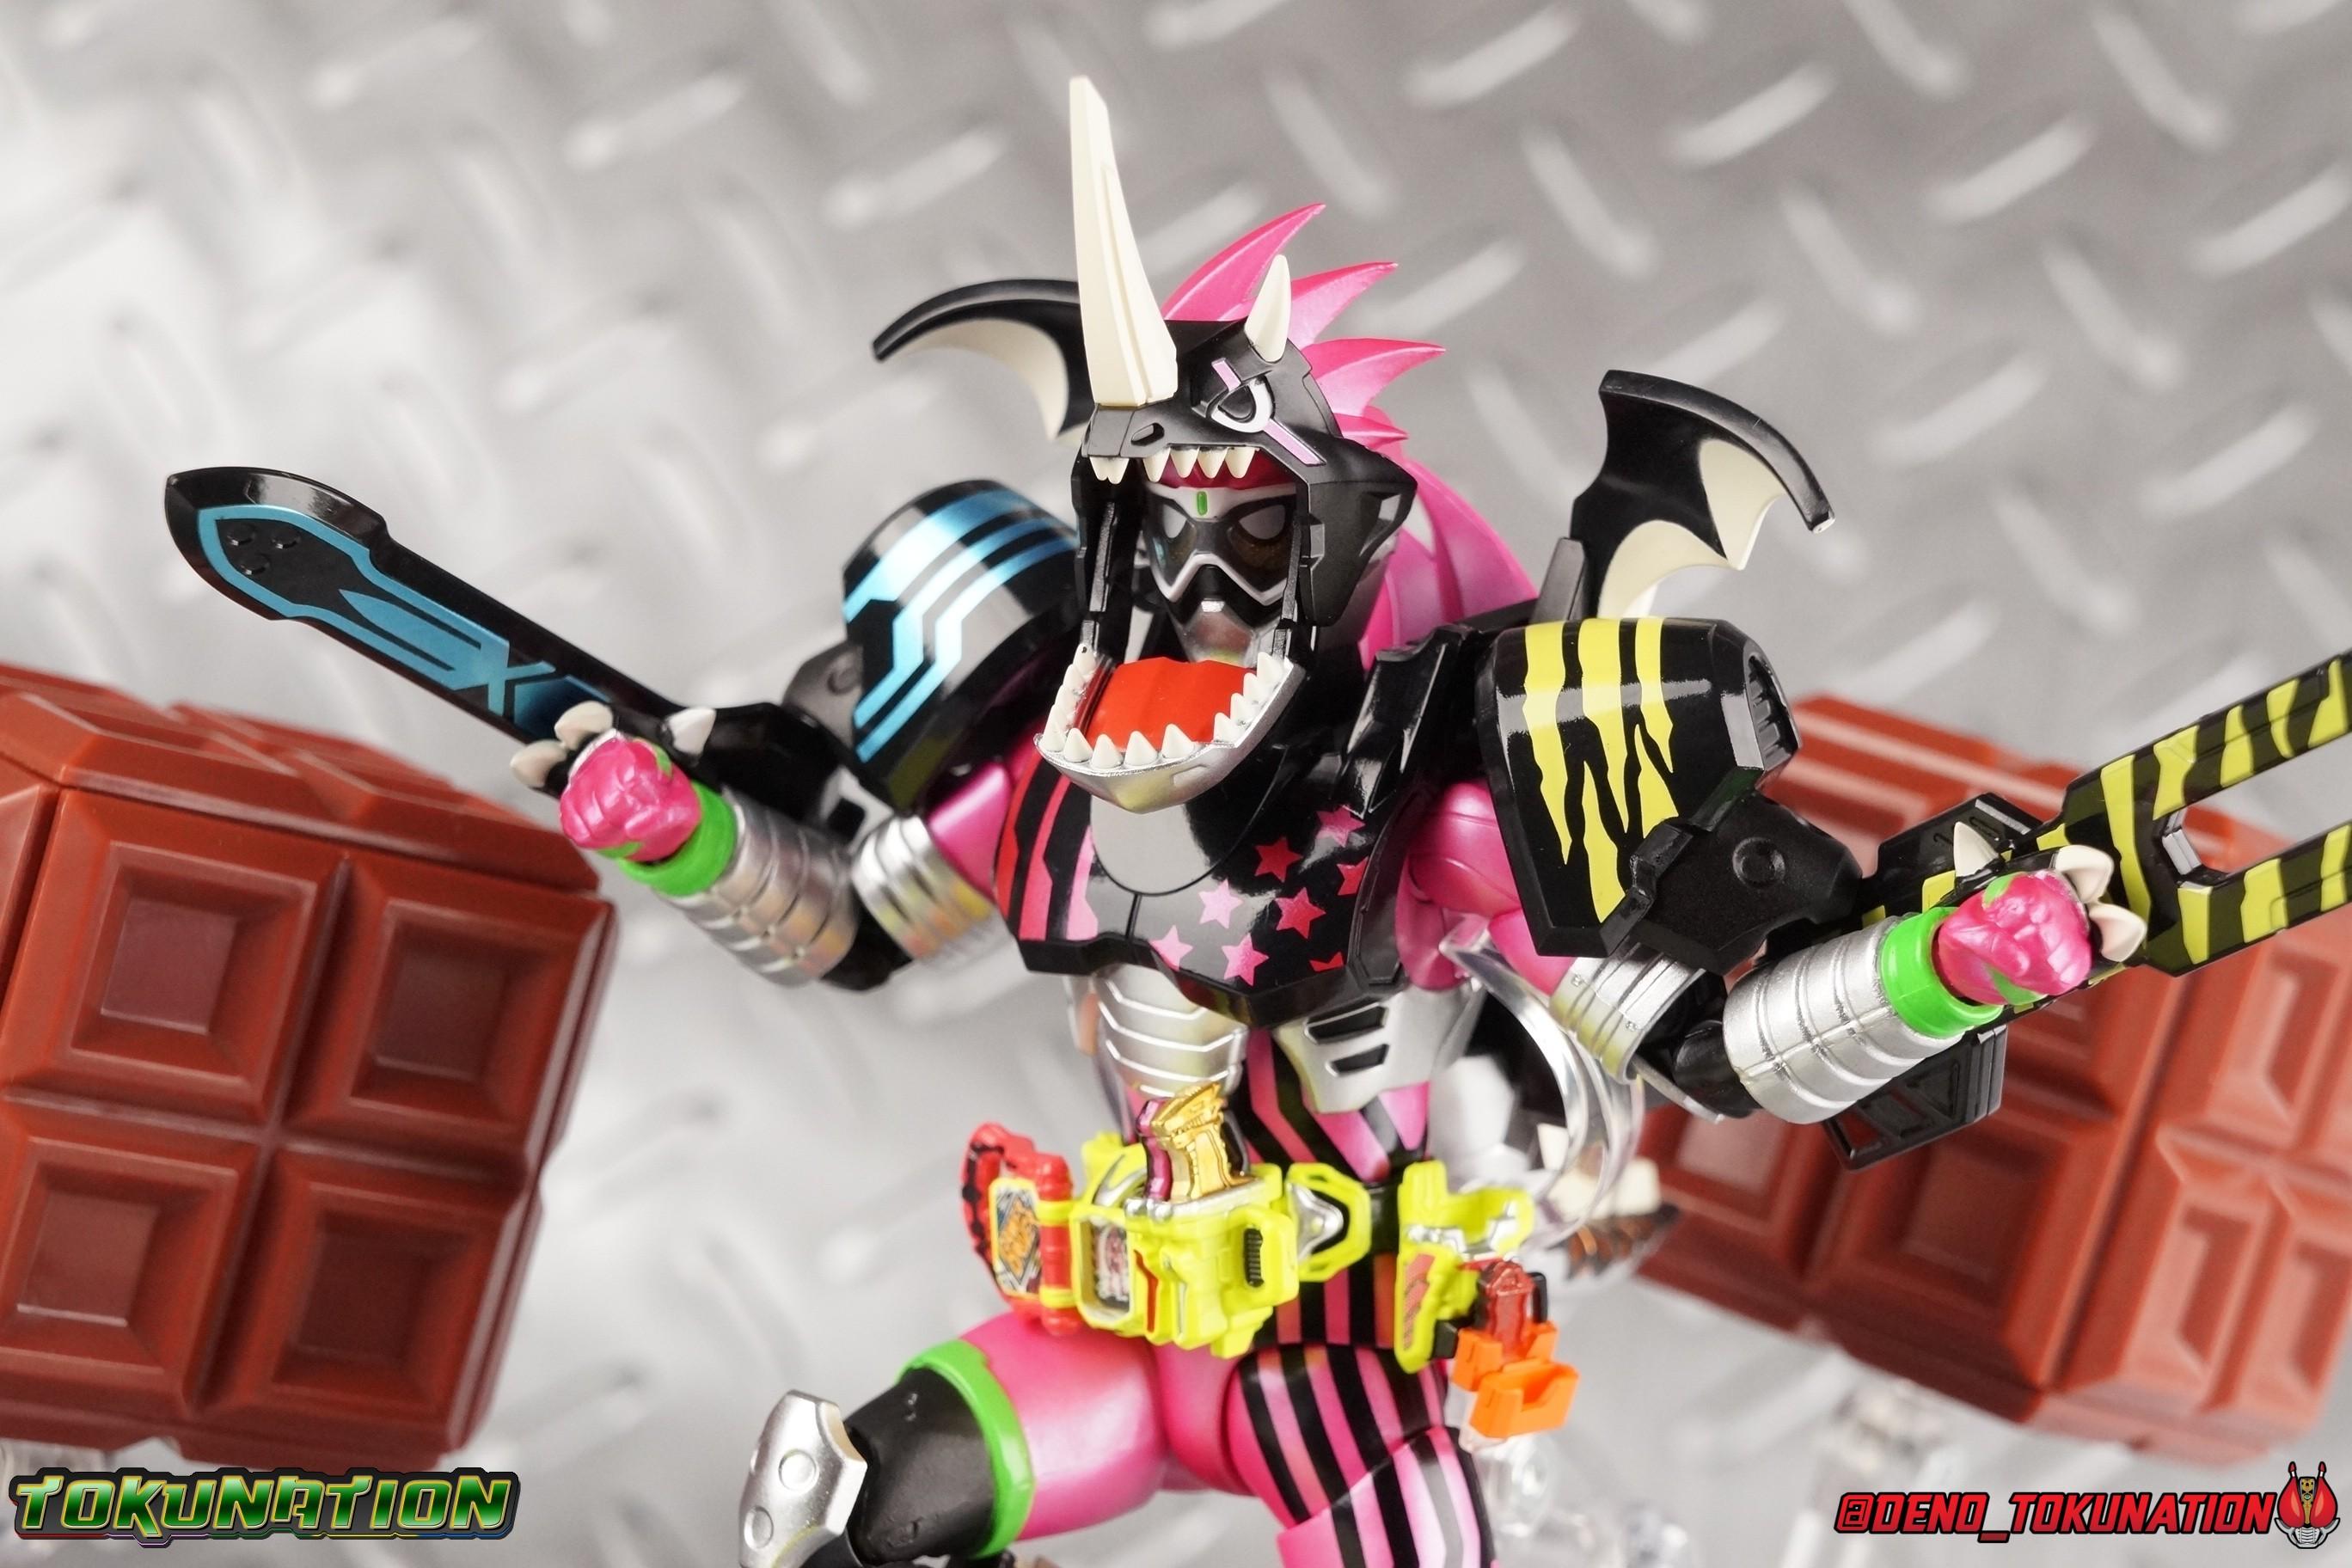 S H Figuarts Kamen Rider Ex Aid Hunter Action Gamer Level 5 Gallery Tokunation